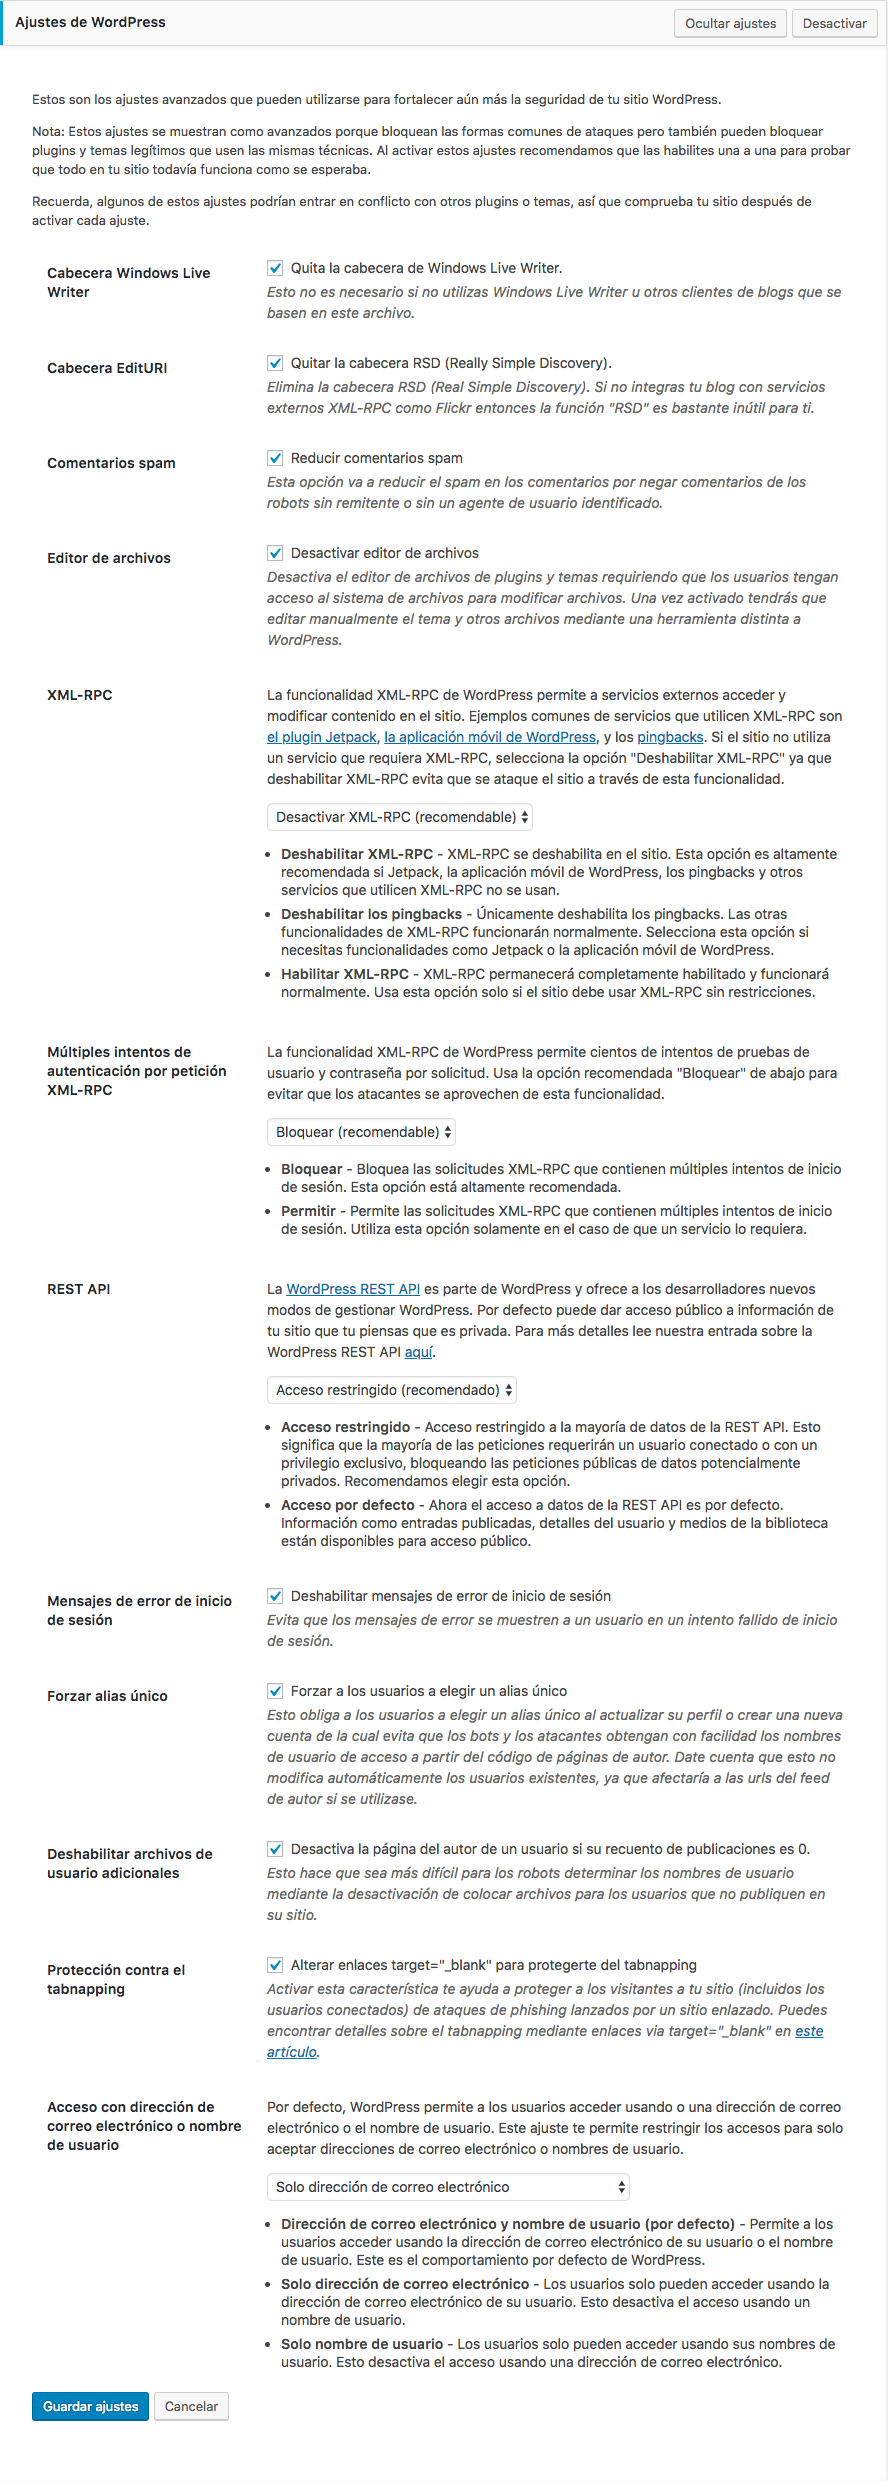 Cómo configurar correctamente iThemes Security • Ayuda WordPress